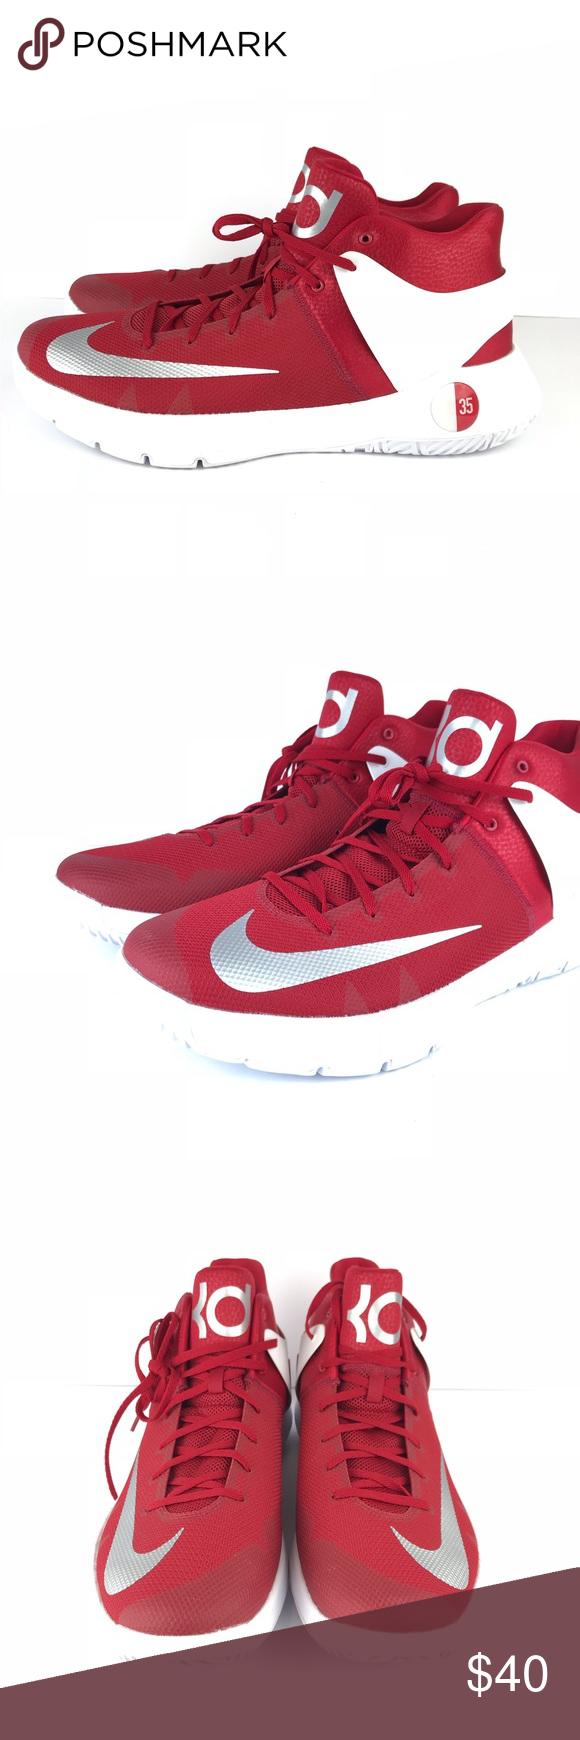 6477b251325b Nike Kevin Durant KD Trey 5 IV Basketball Shoes New without box Nike Kevin  Durant KD Trey 5 IV Basketball Shoes 856484- 661 Nike Men s Size 17.5 Nike  Shoes ...